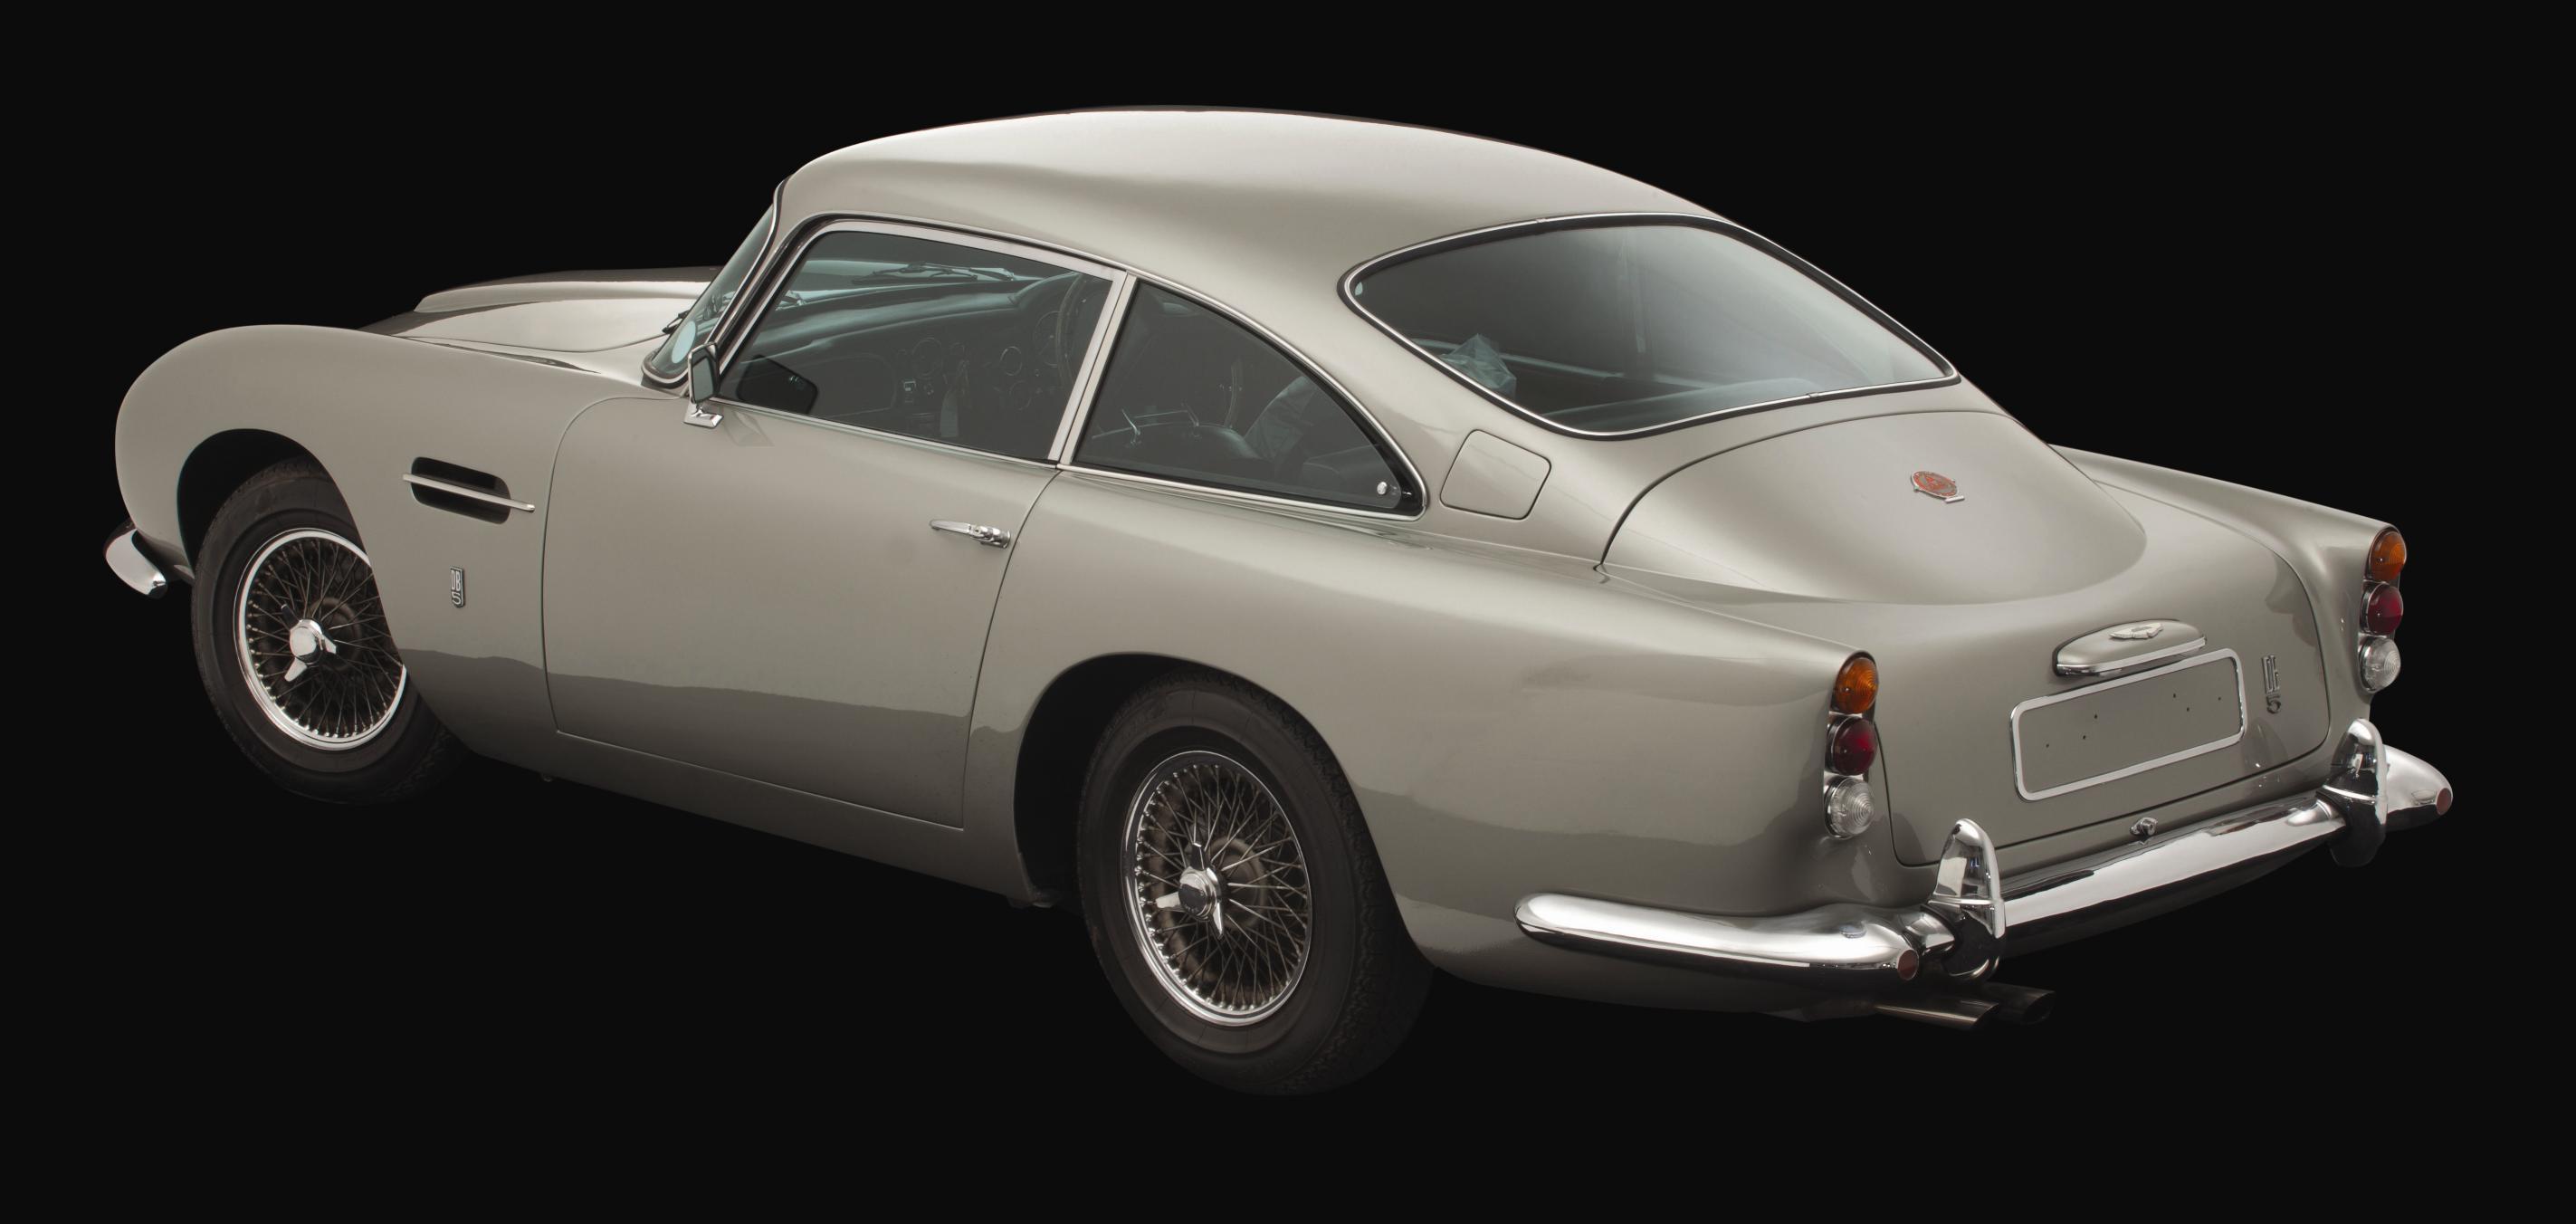 Aston Martin DB5 George Harrison